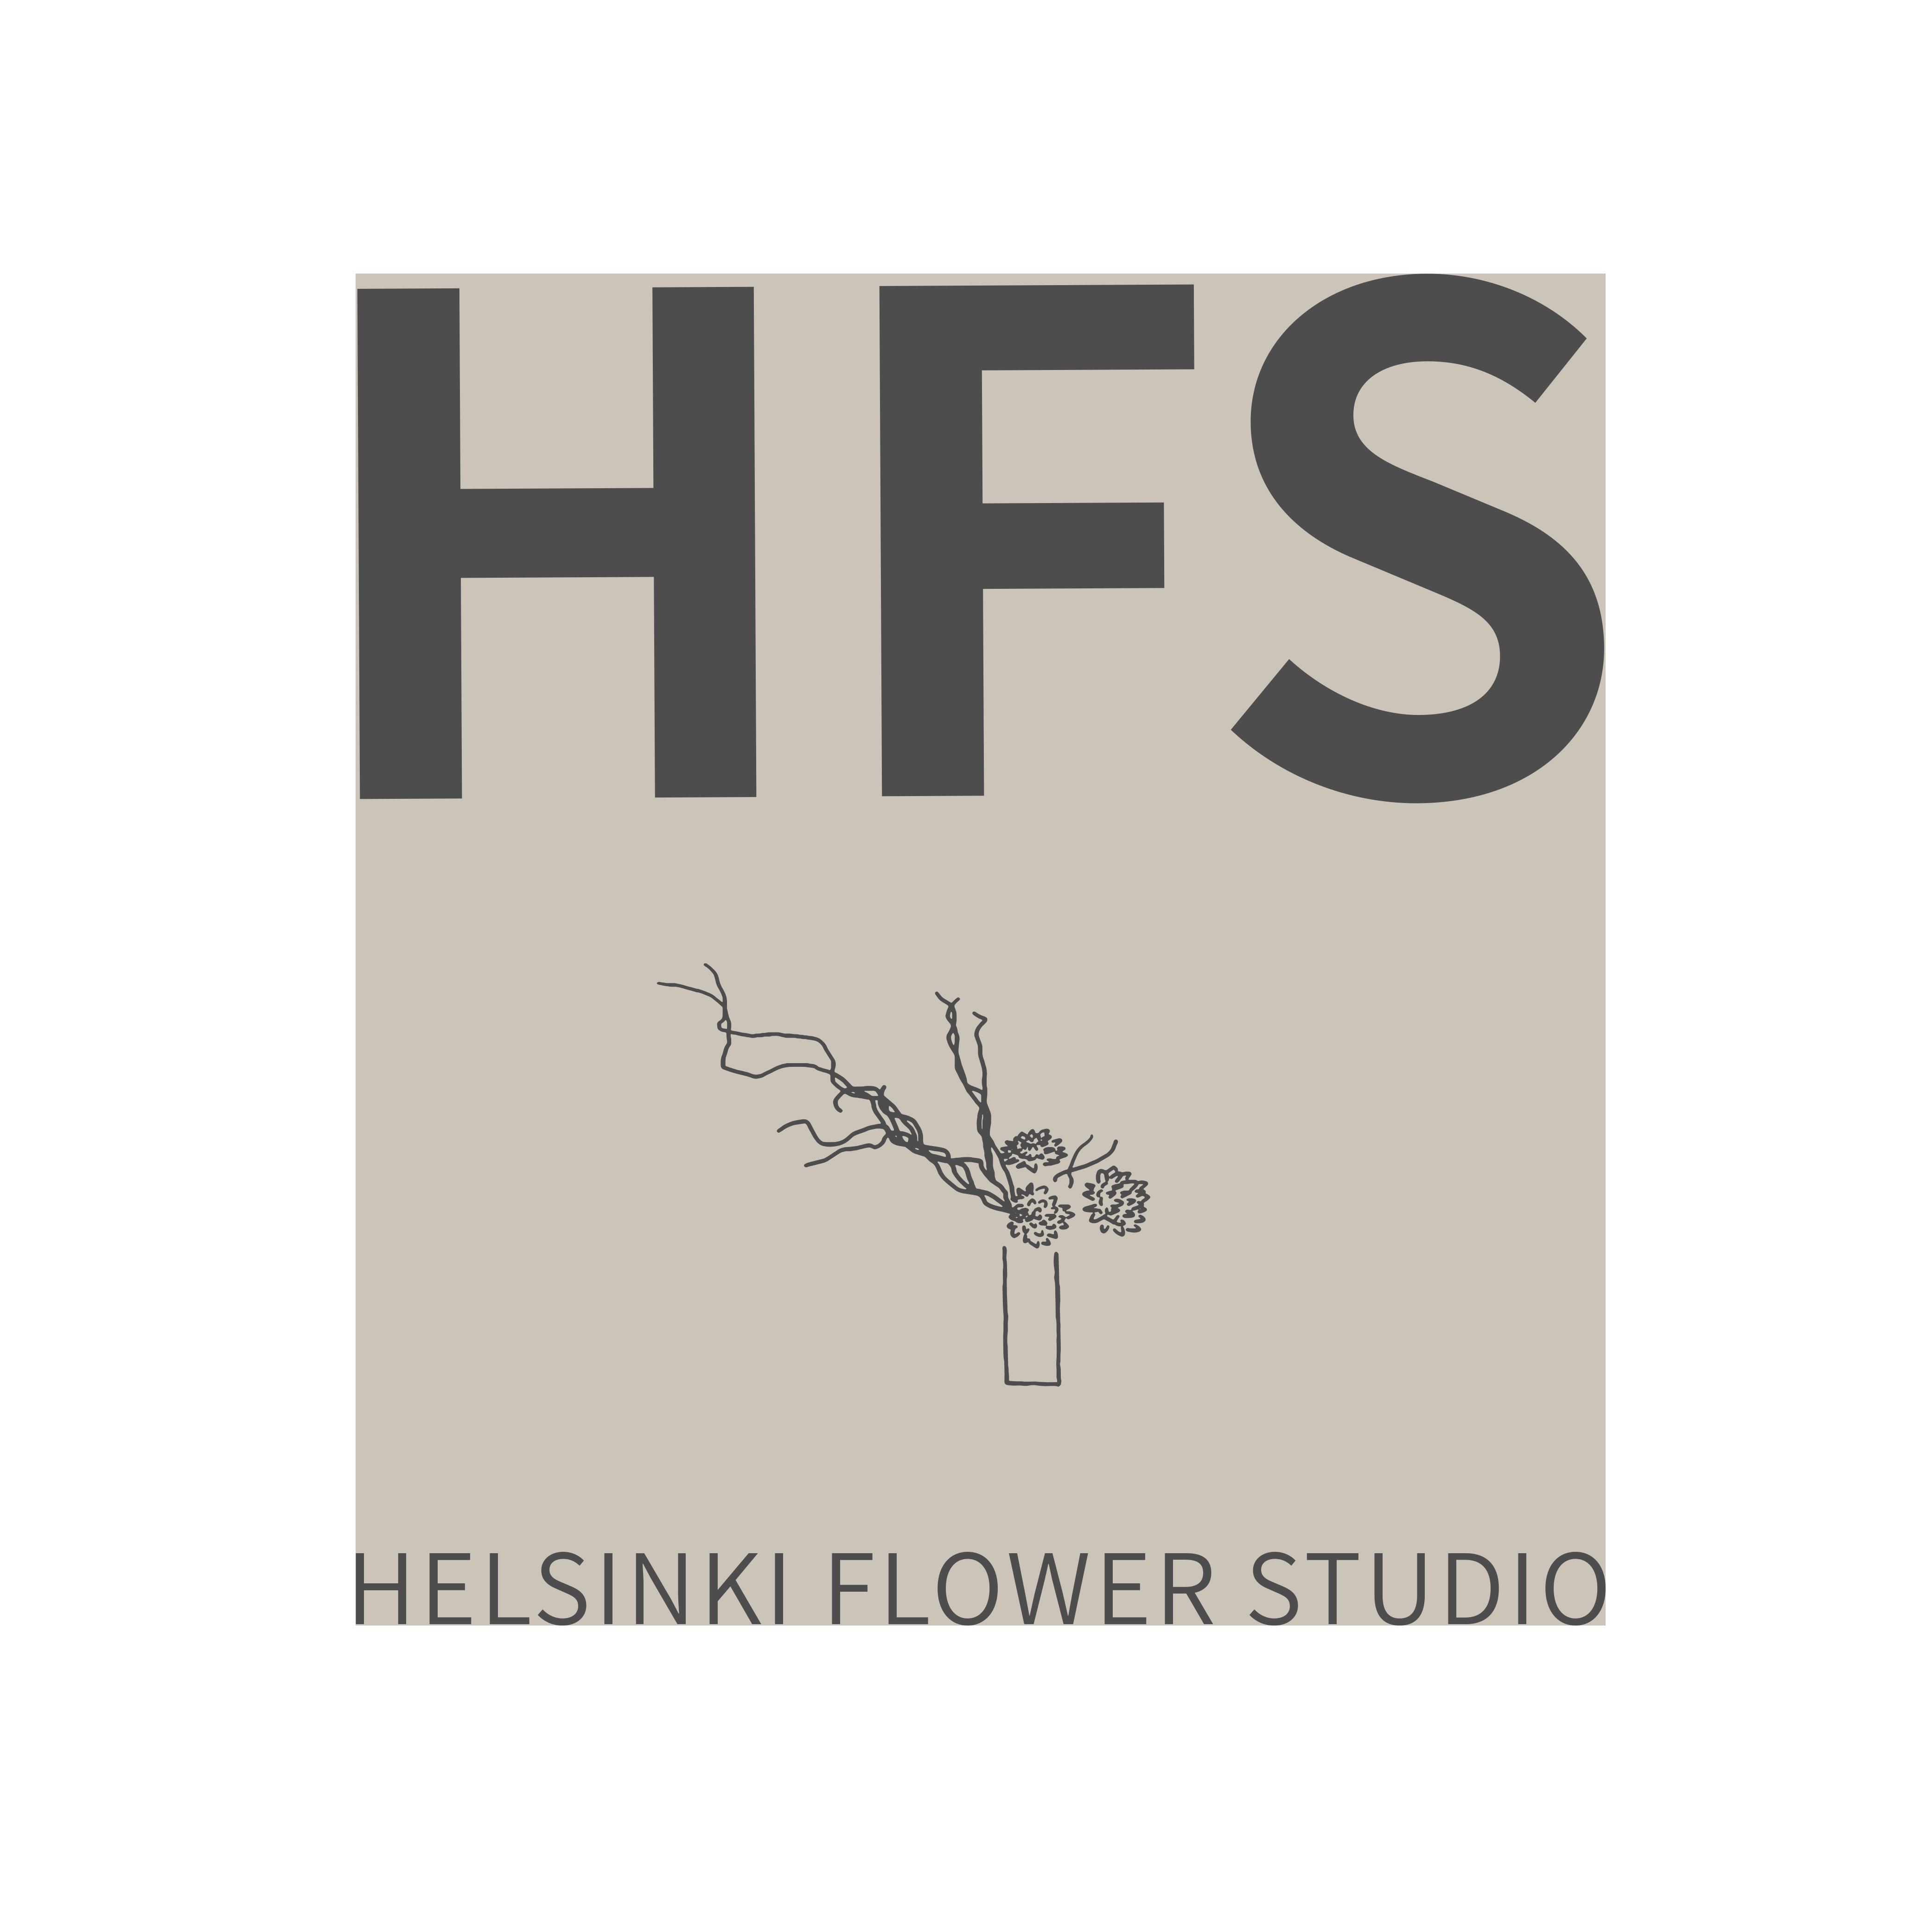 Helsinki Flower Studio